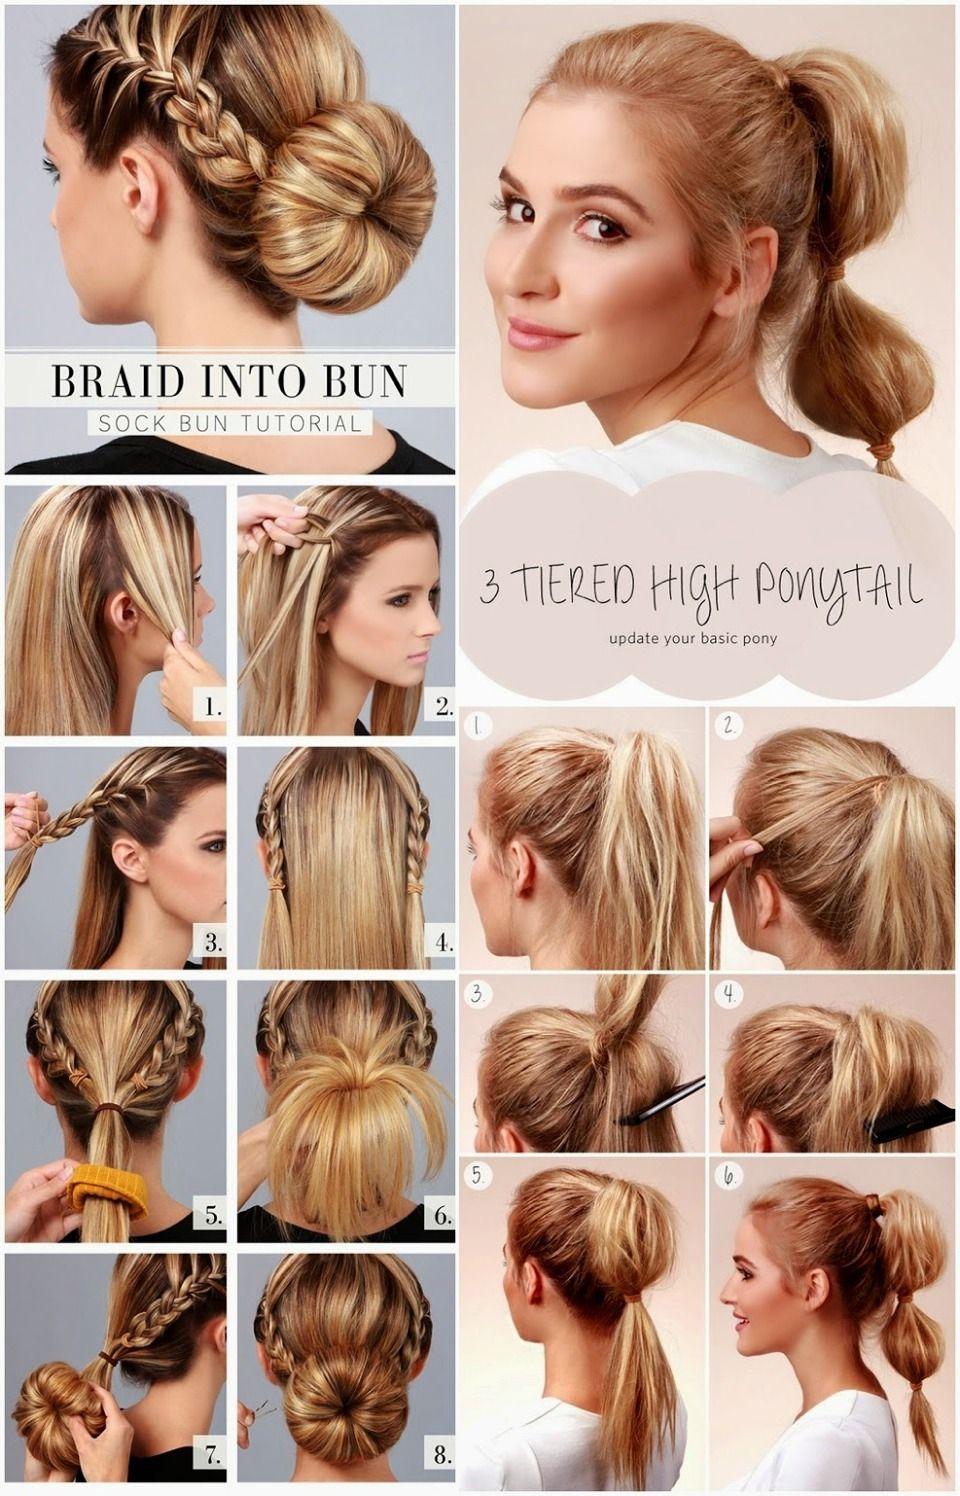 4 Cute Hairstyles To Wear This Summer Cute Hairstyles Easy Summer Hairstyles Quick Hairstyles